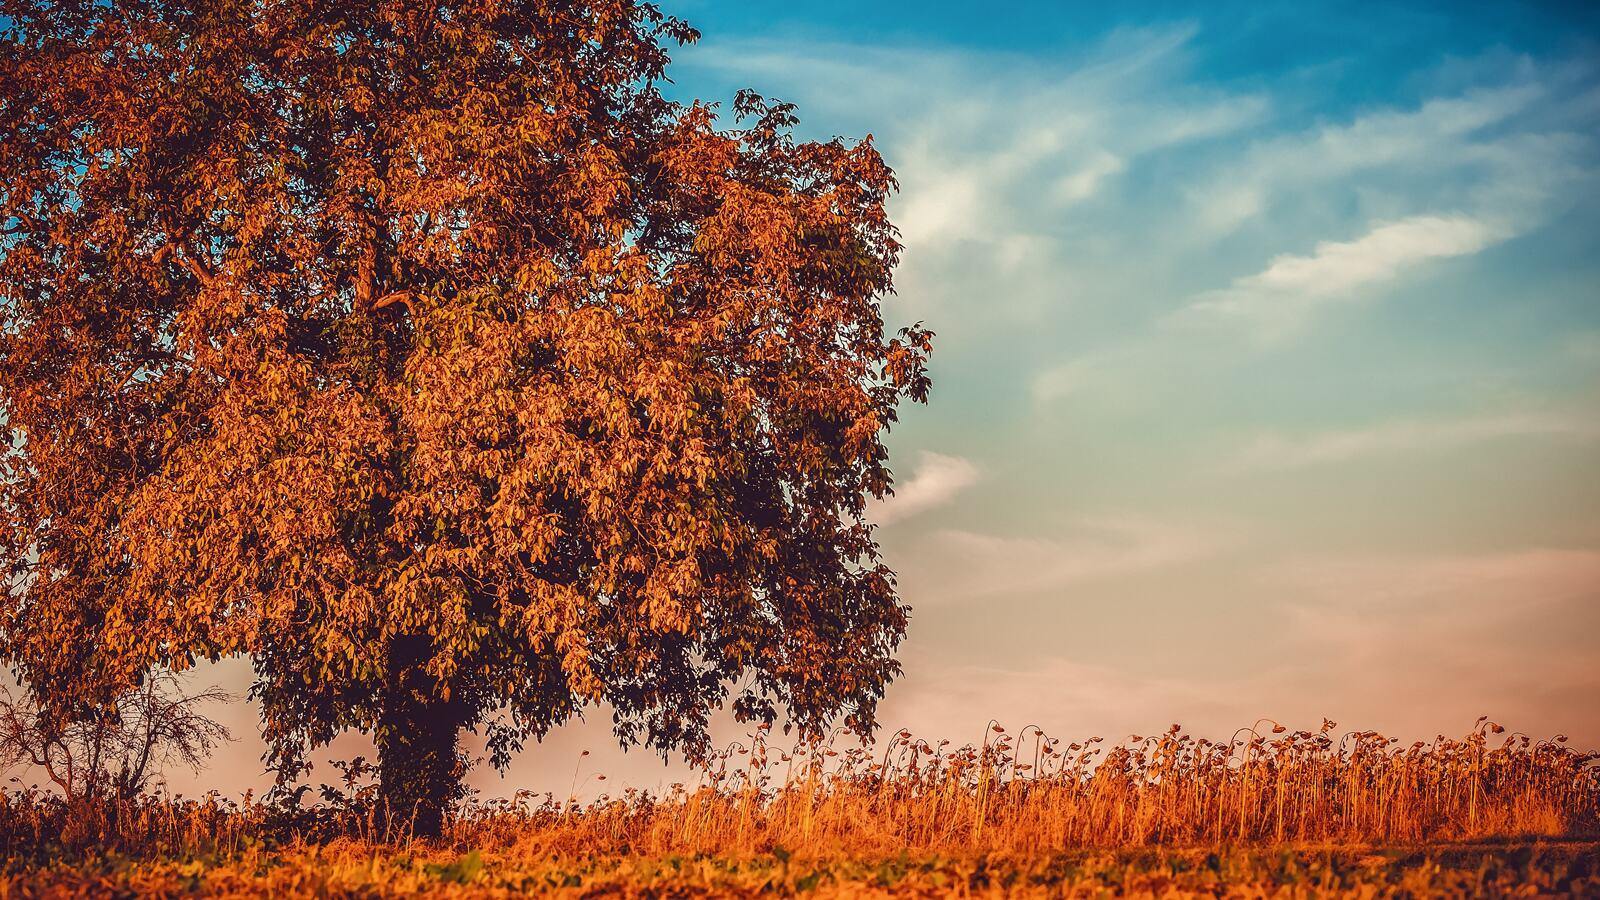 Autumn tree landscape